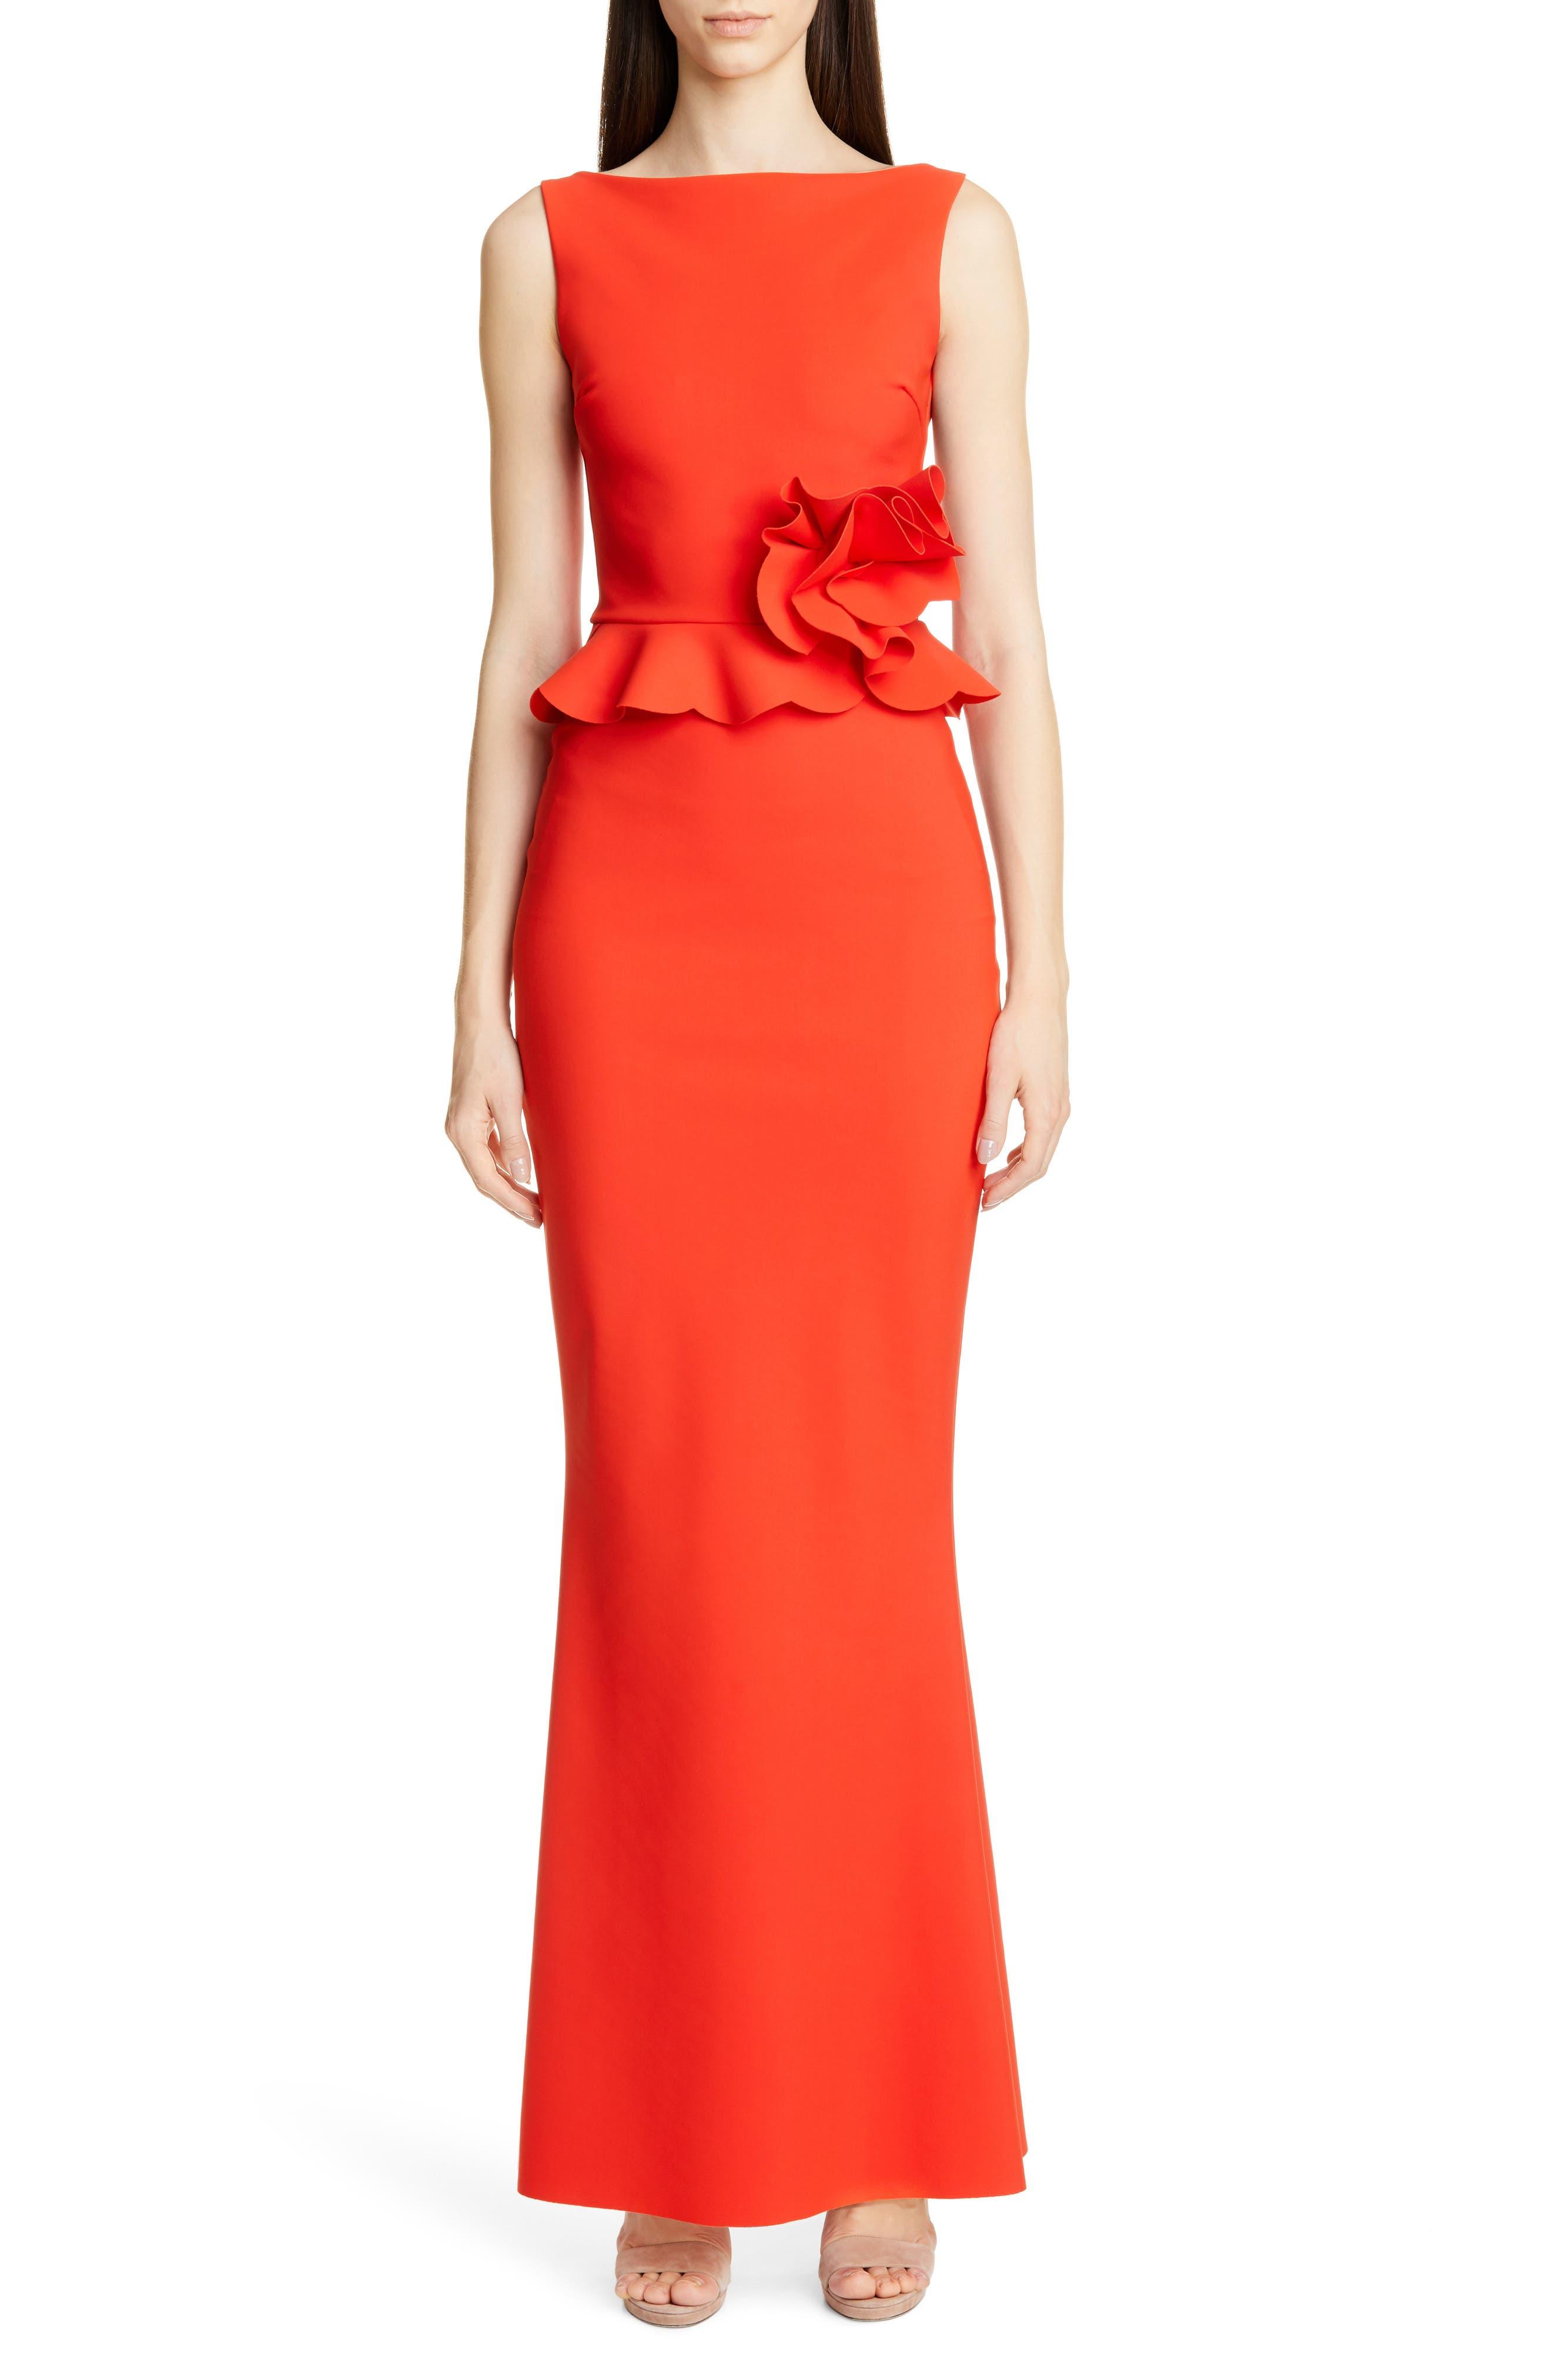 Chiara Boni La Petite Robe Side Ruffle Evening Dress, US / 48 IT - Red